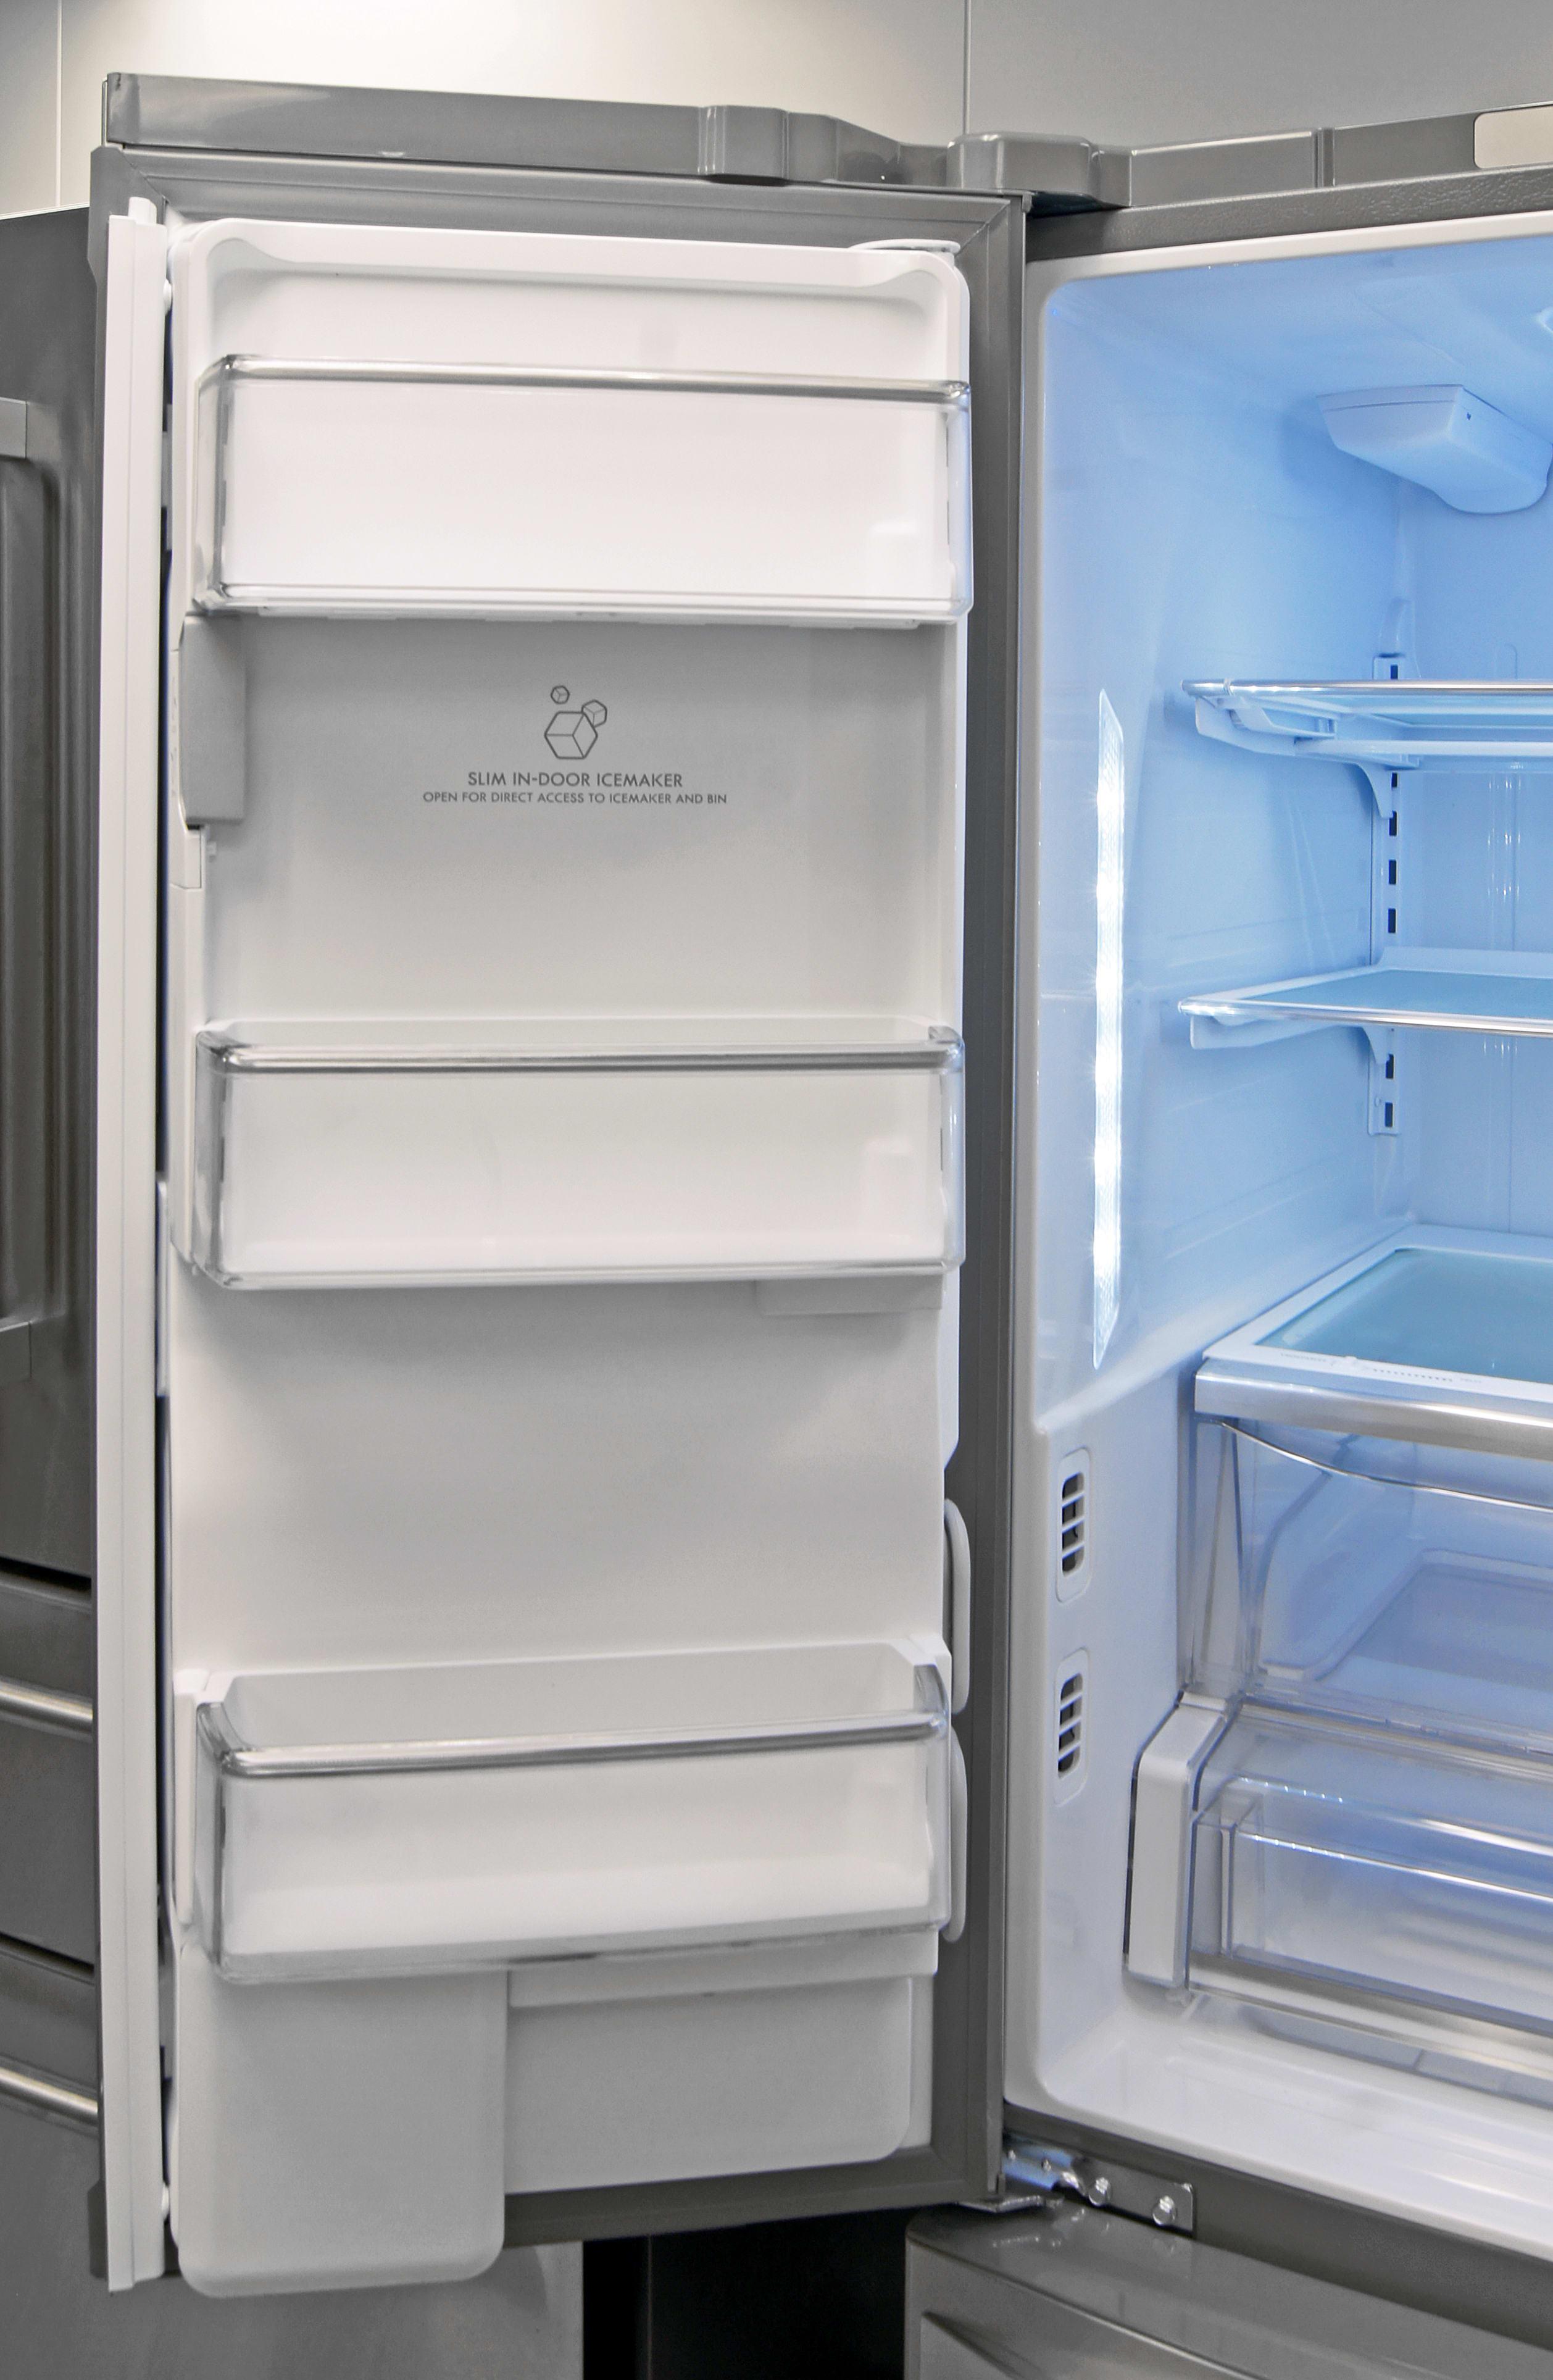 Kenmore Elite 74033 Refrigerator Review - Reviewed Refrigerators